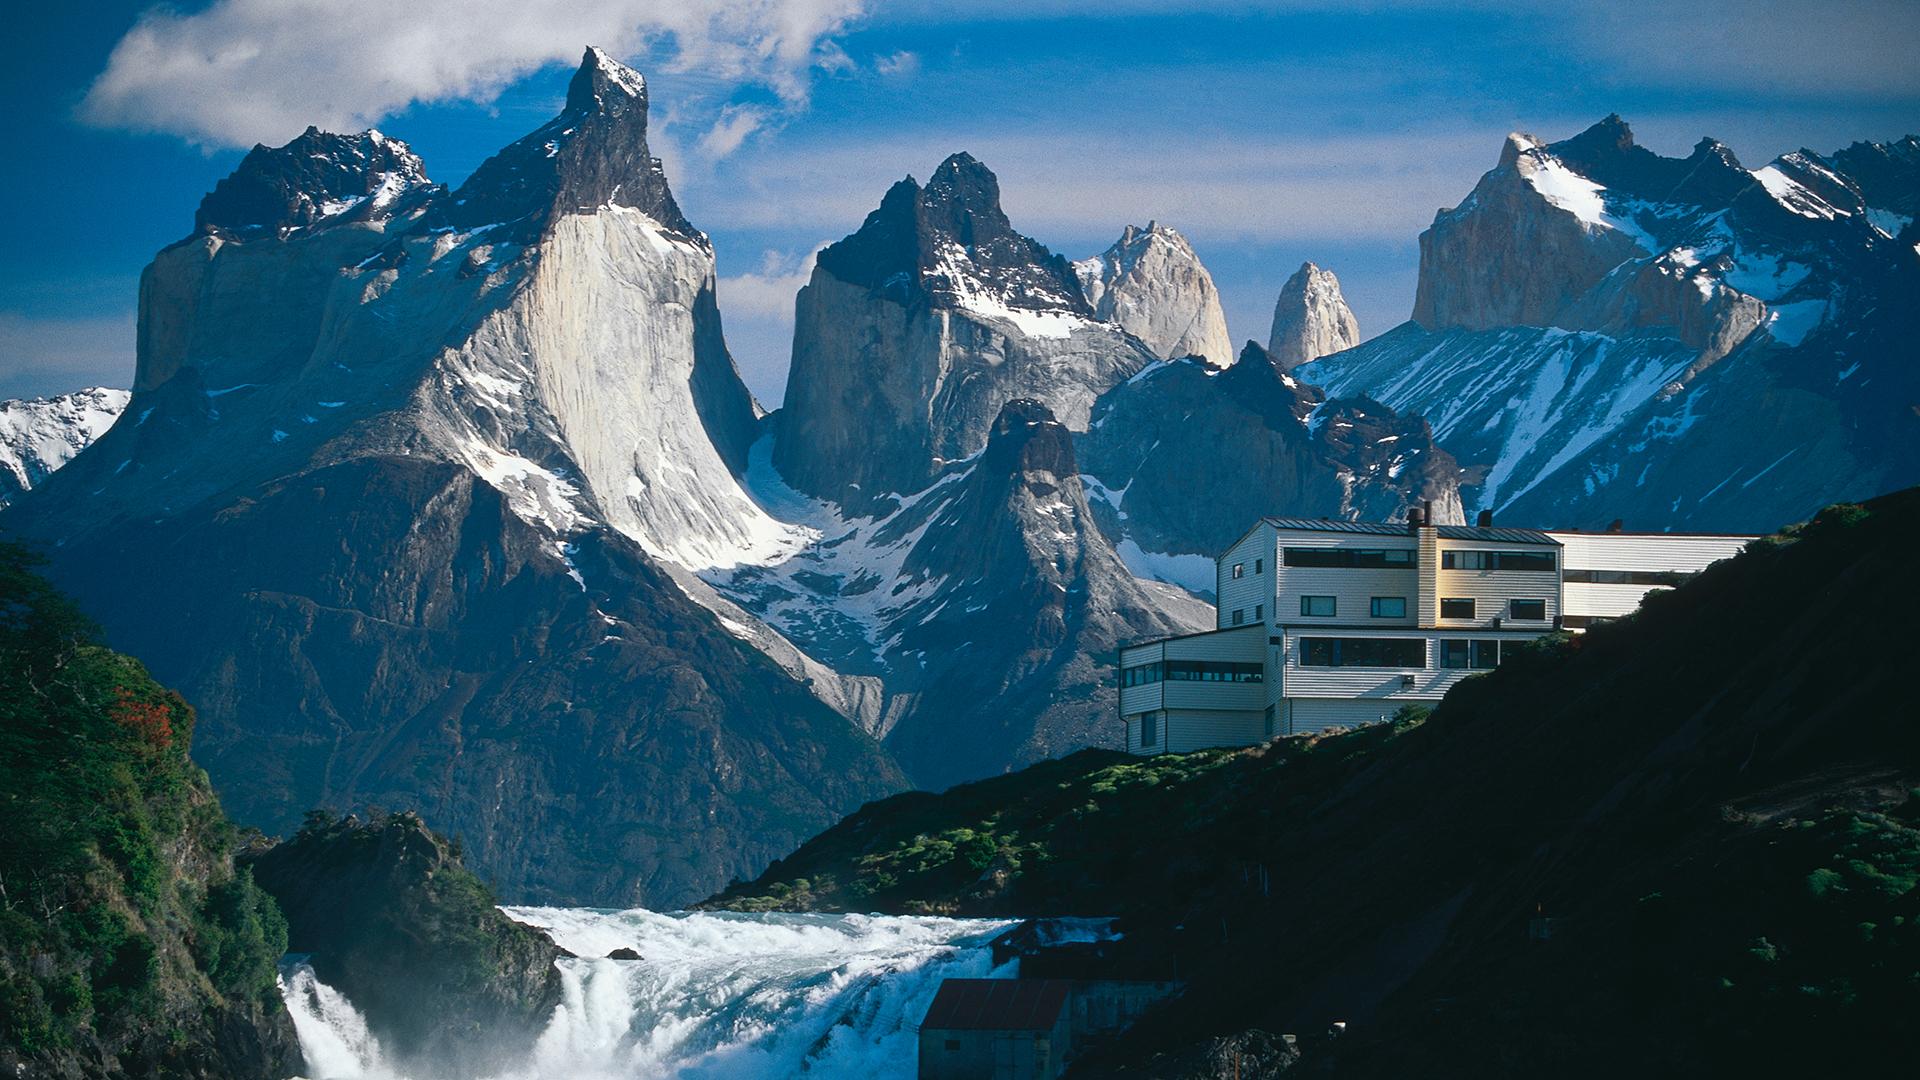 Patagonia South America >> Explora Patagonia Torres Del Paine National Park Andbeyond